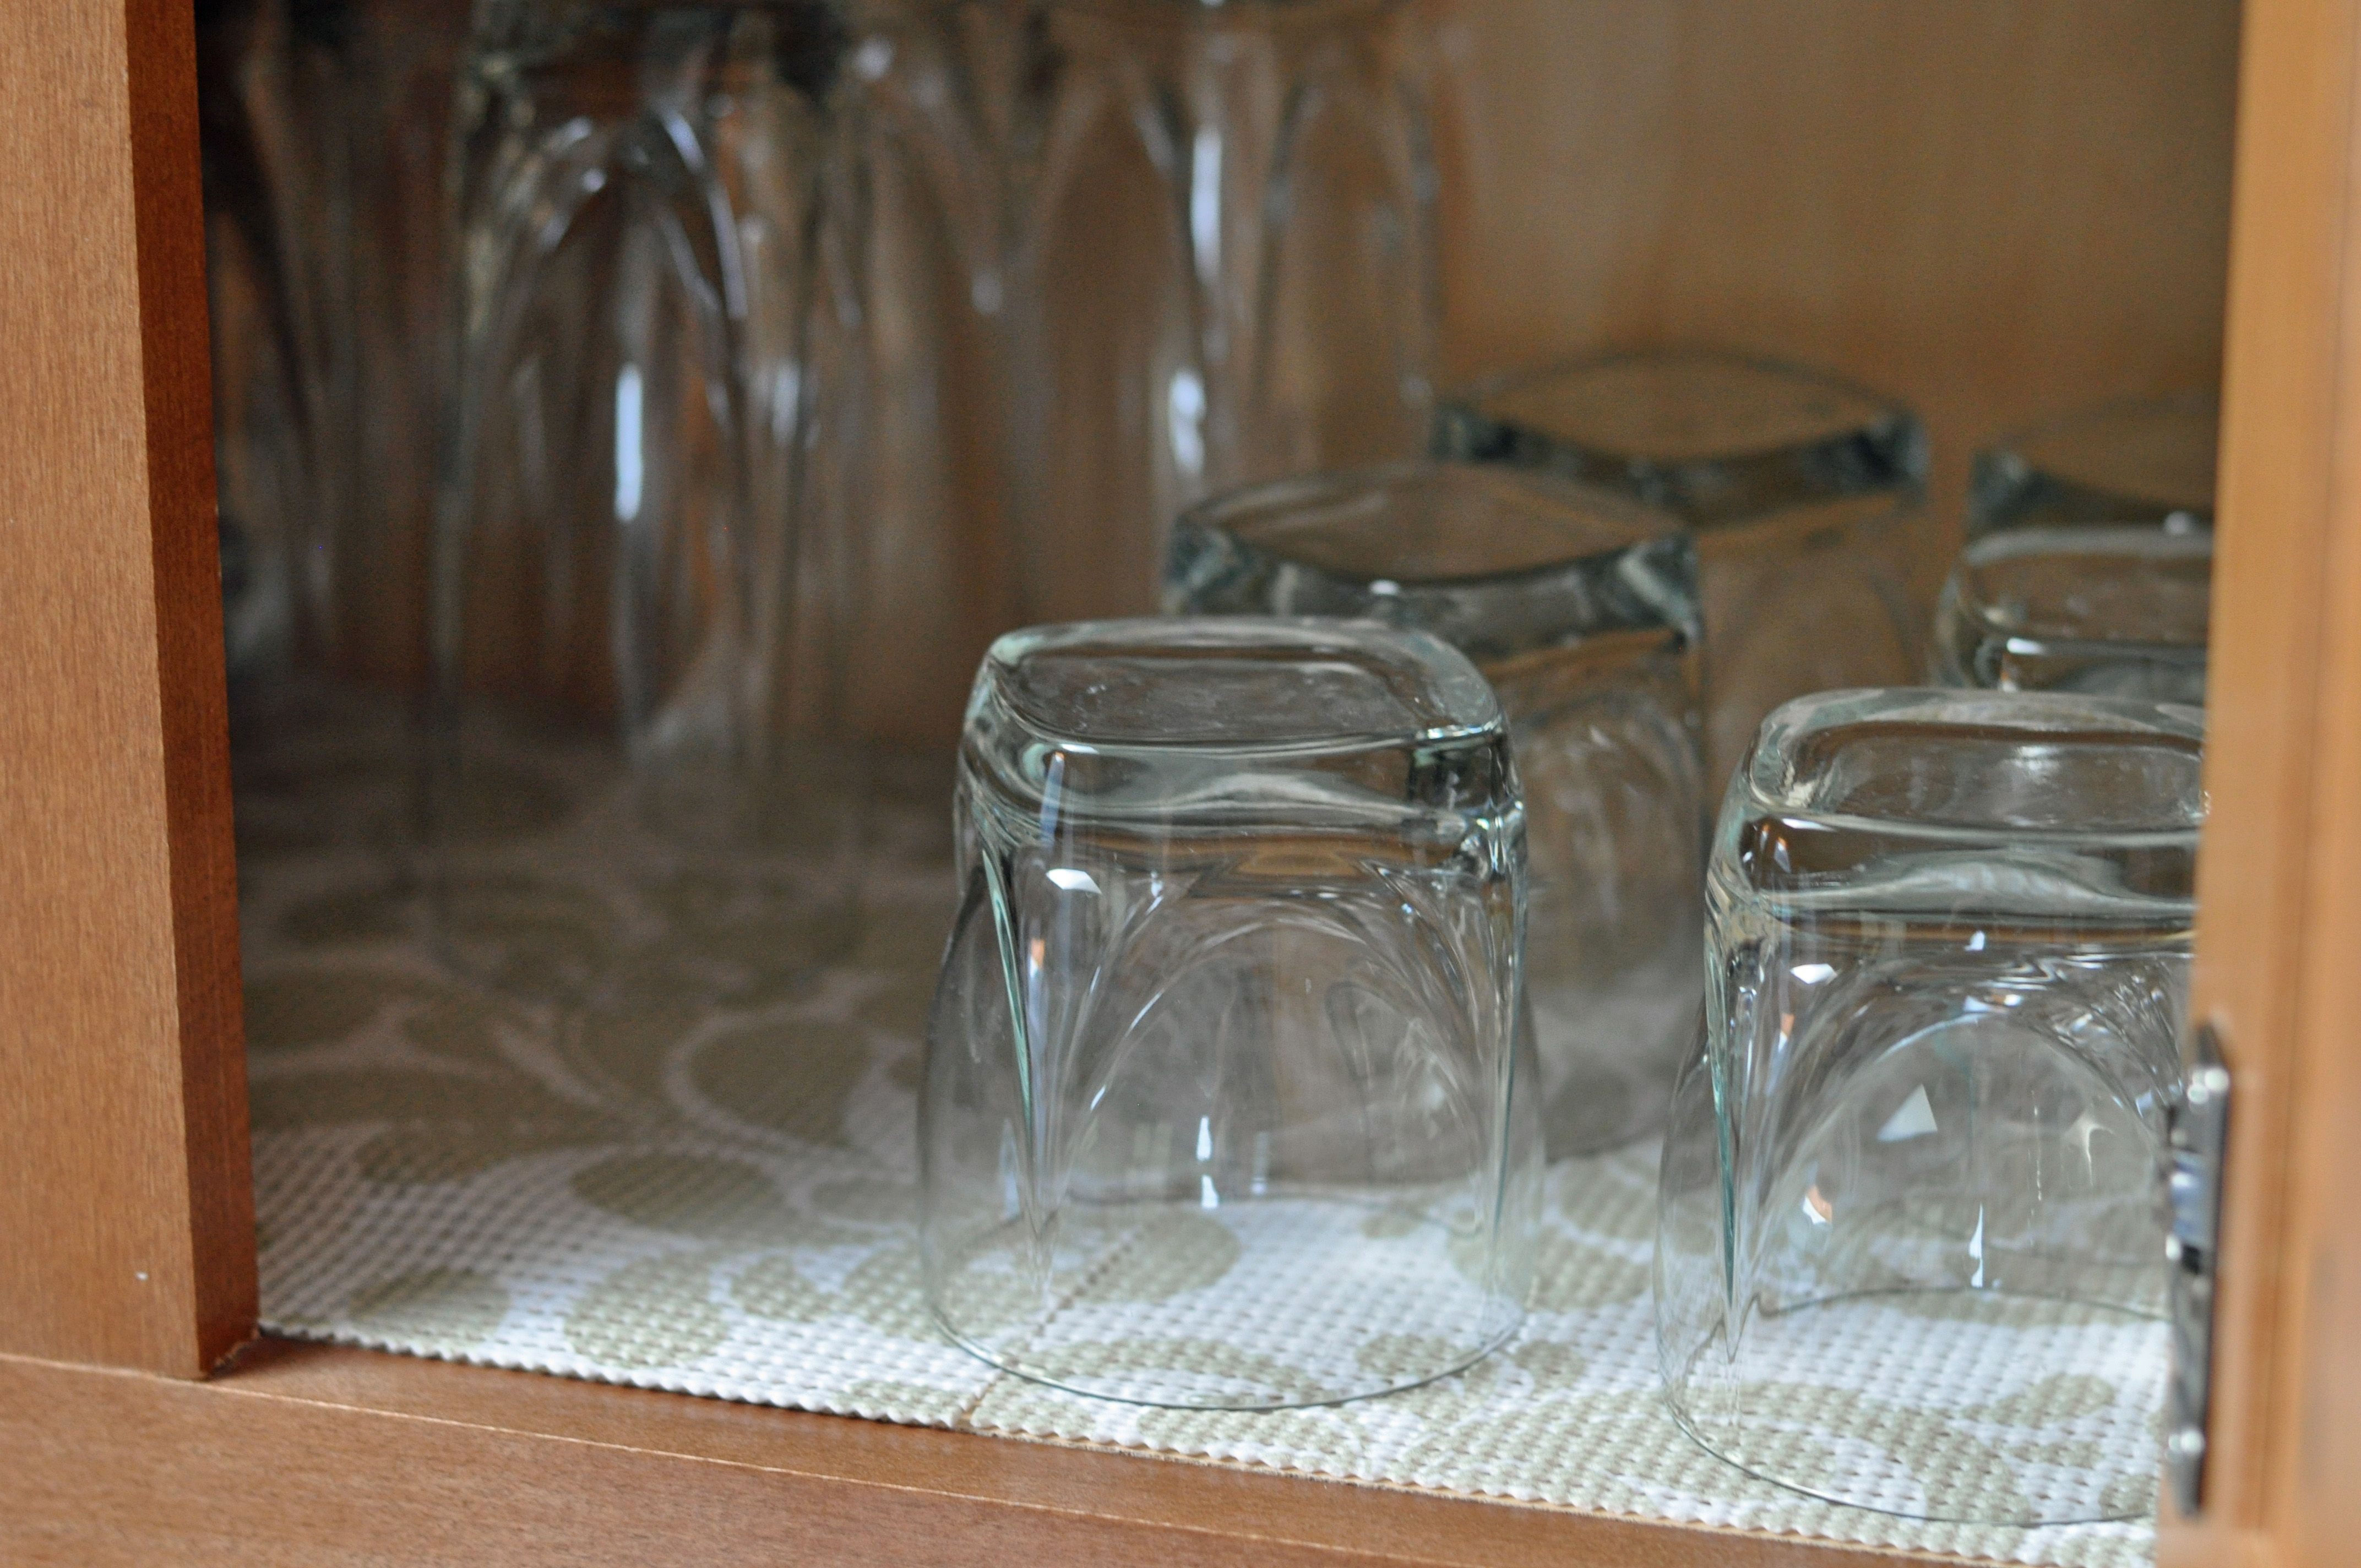 Kitchen drawer liner ideas latulufofeed pinterest